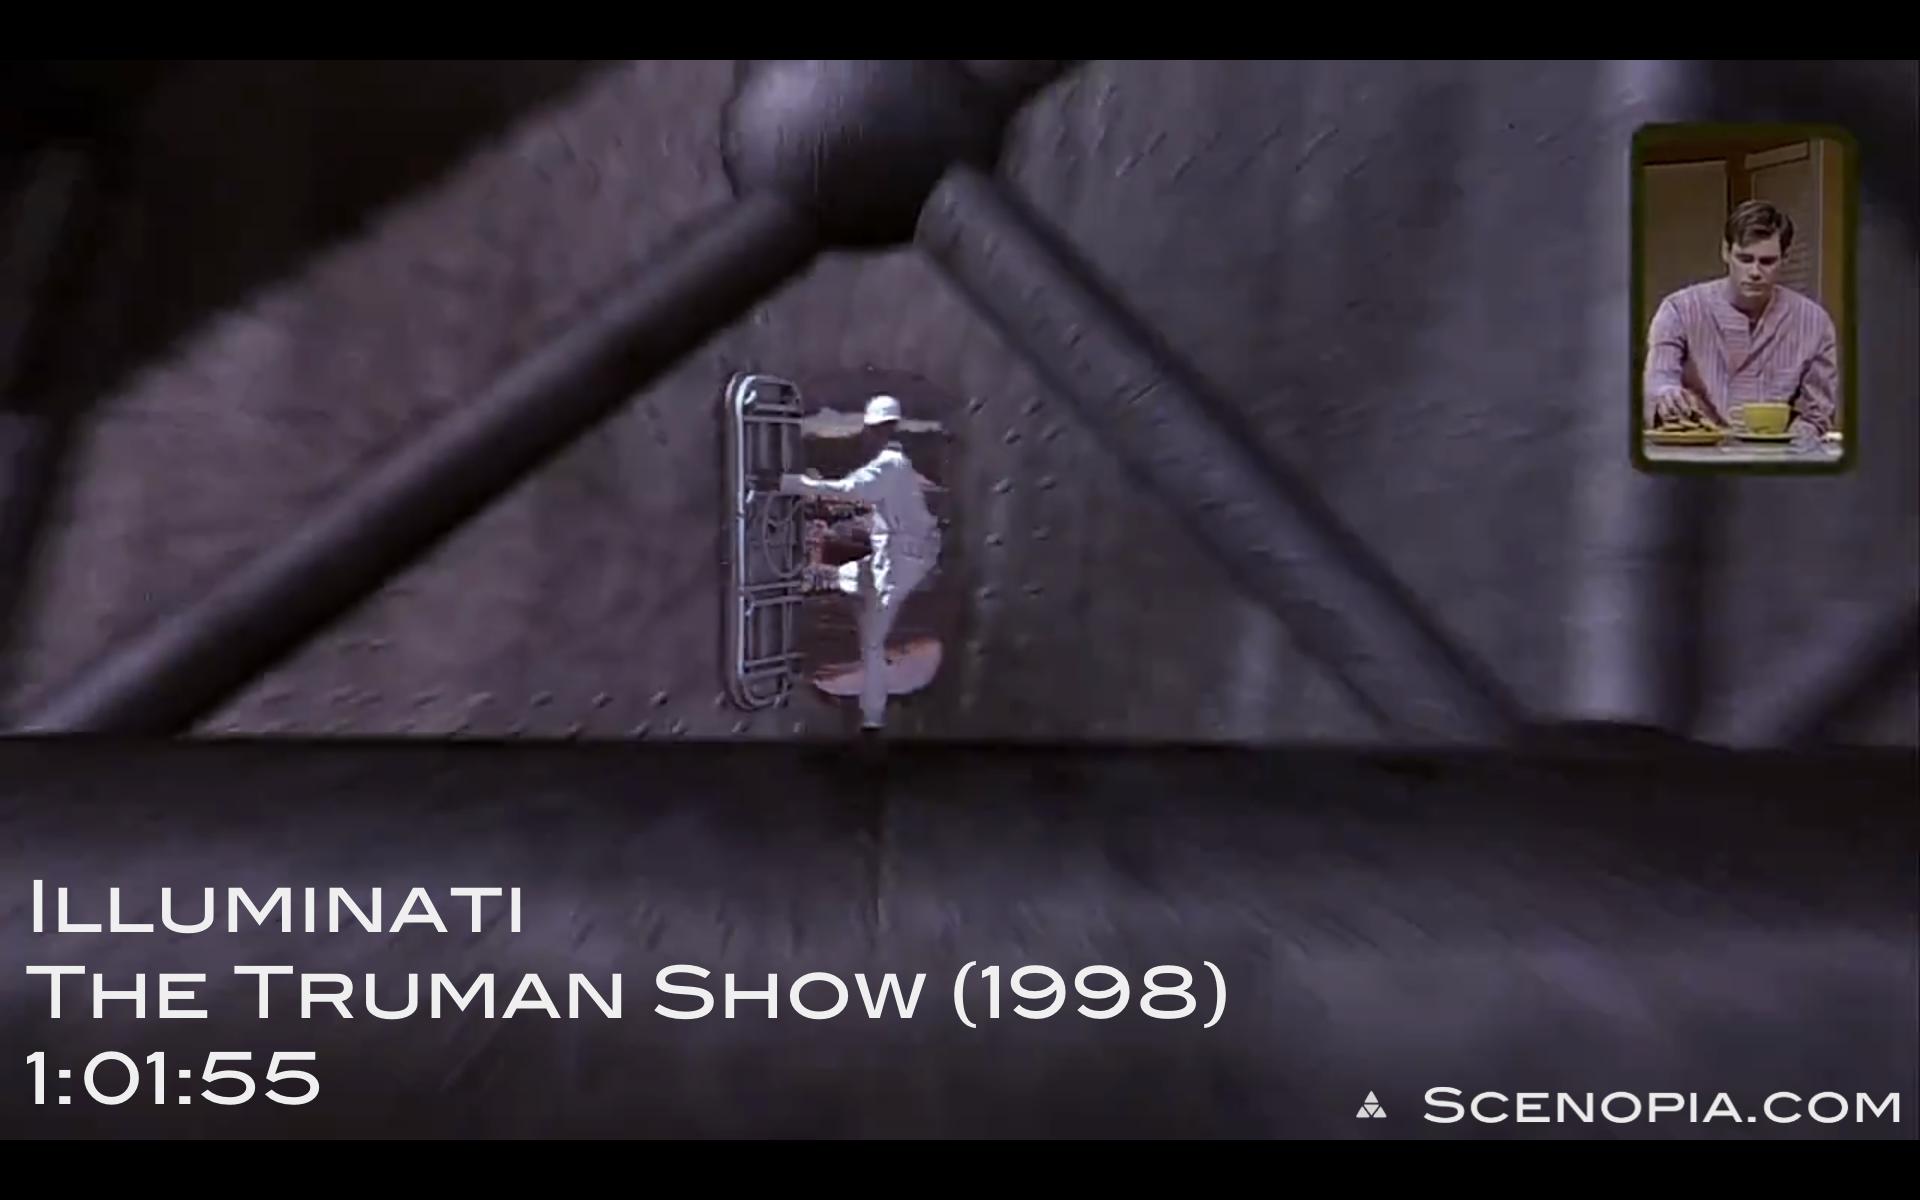 The truman show illuminati pinterest the truman show malvernweather Choice Image